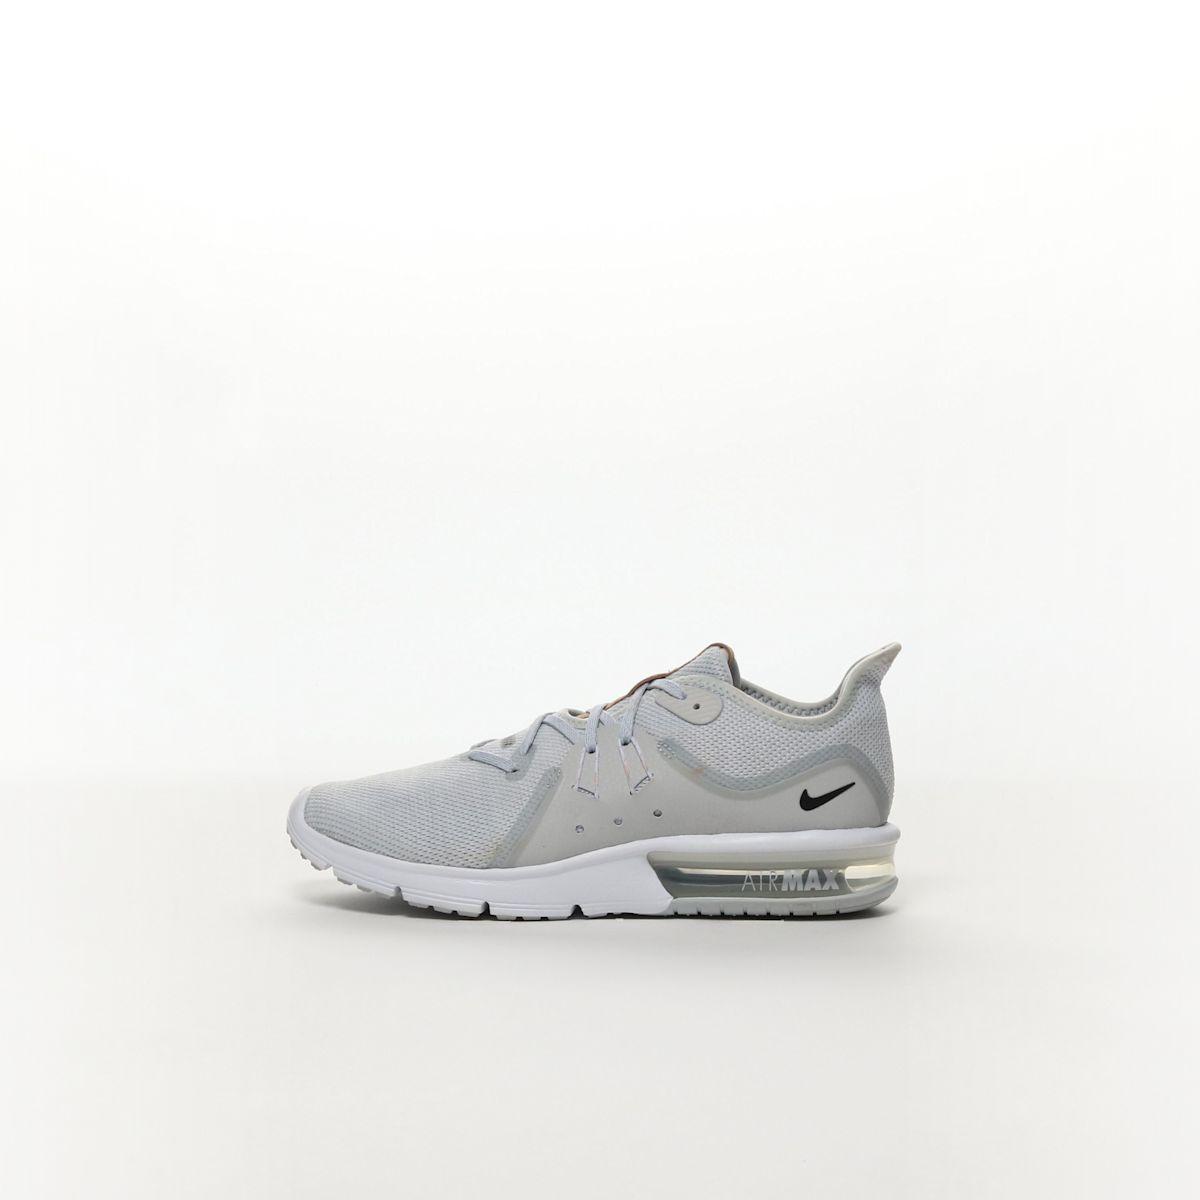 low priced 780f1 e209a Nike Air Max Sequent 3 Men s Running Shoe - PURE PLATINUM BLACK-WHITE –  Resku